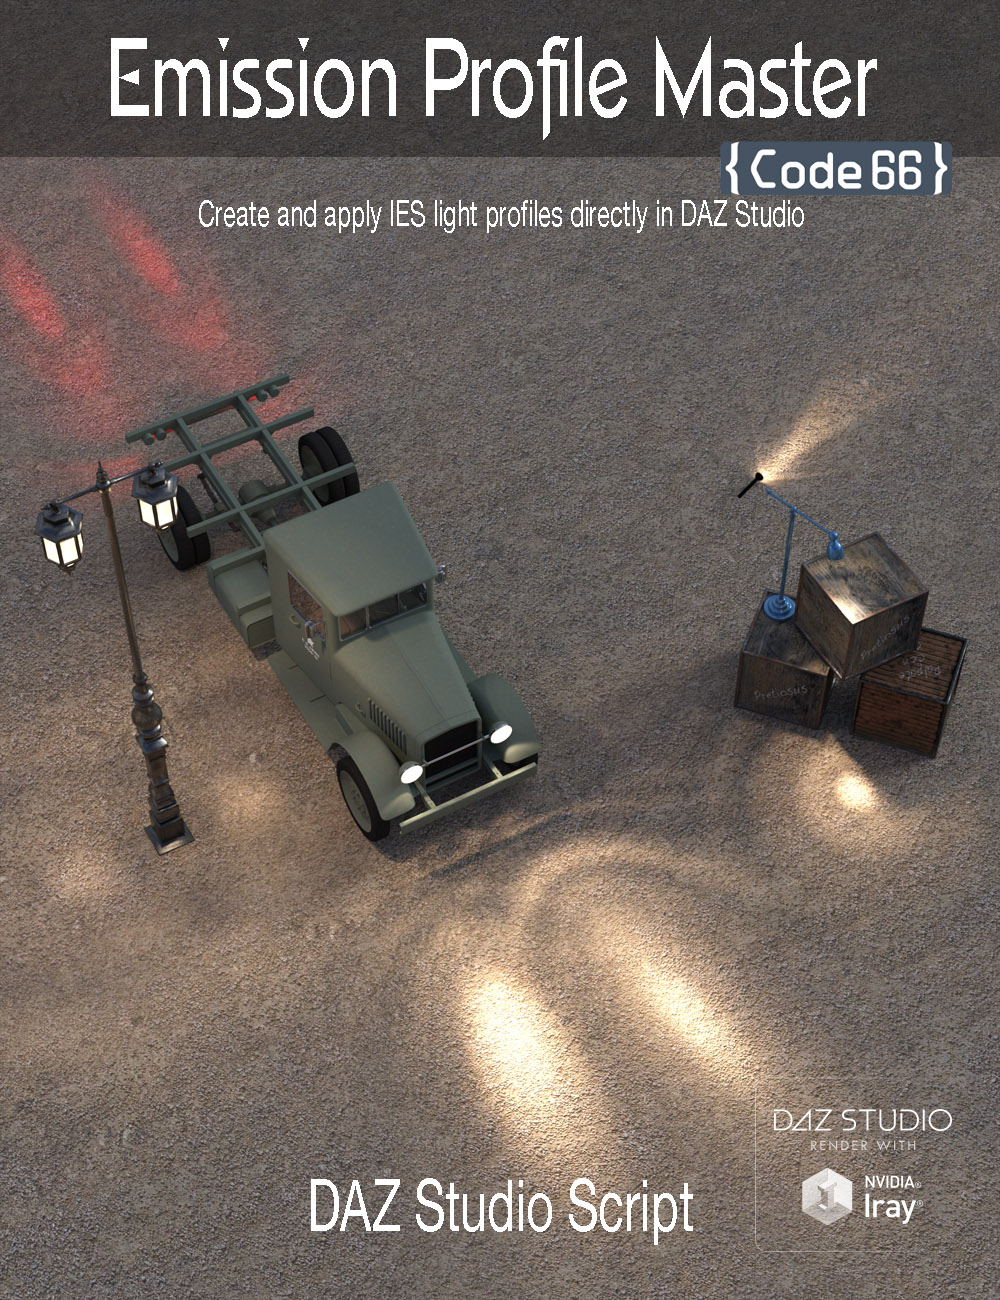 Emission Profile Master by: Code 66, 3D Models by Daz 3D